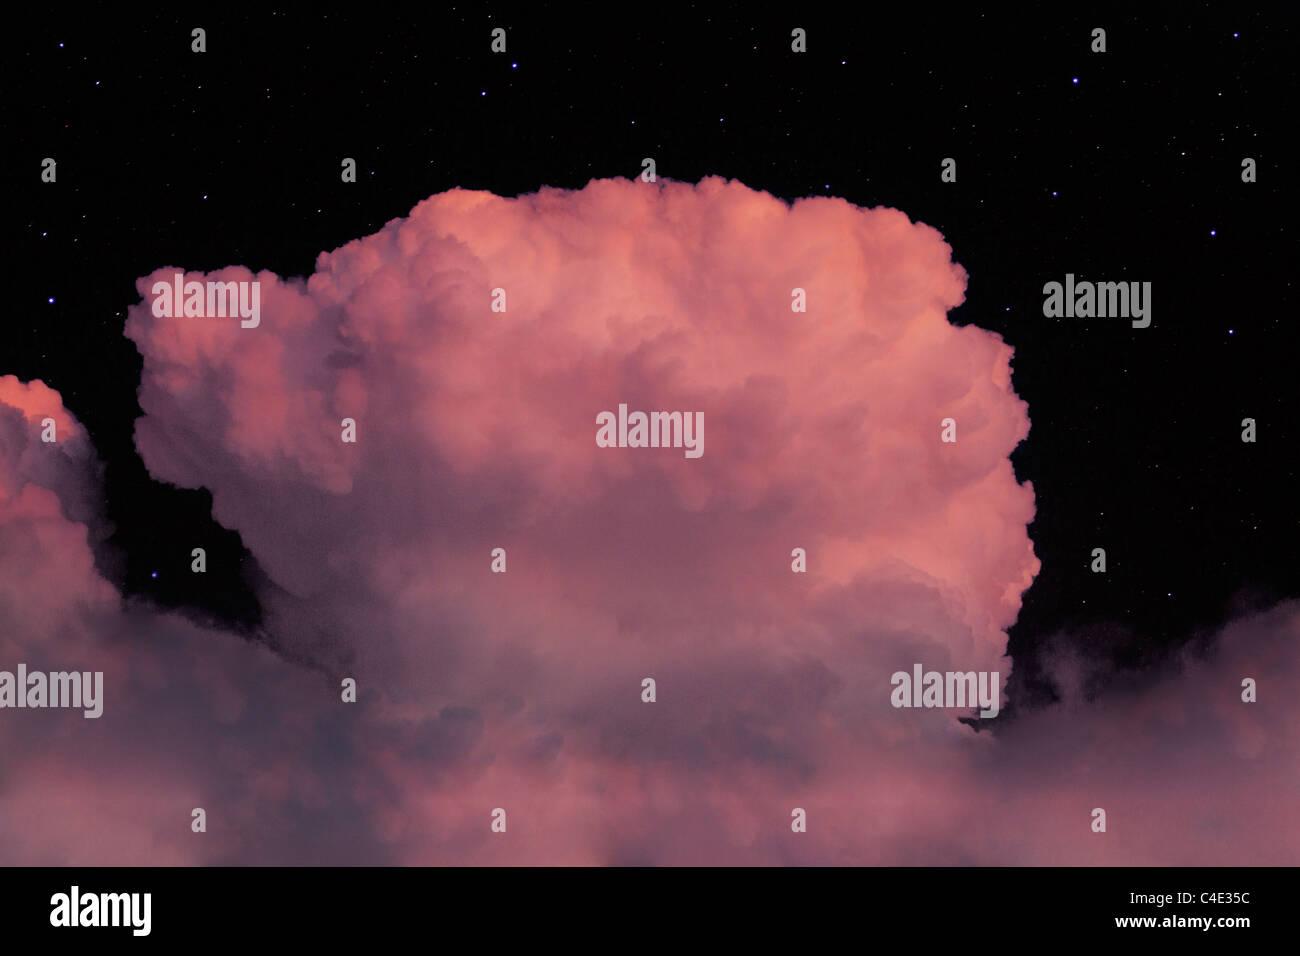 ominous clouds in black sky - Stock Image